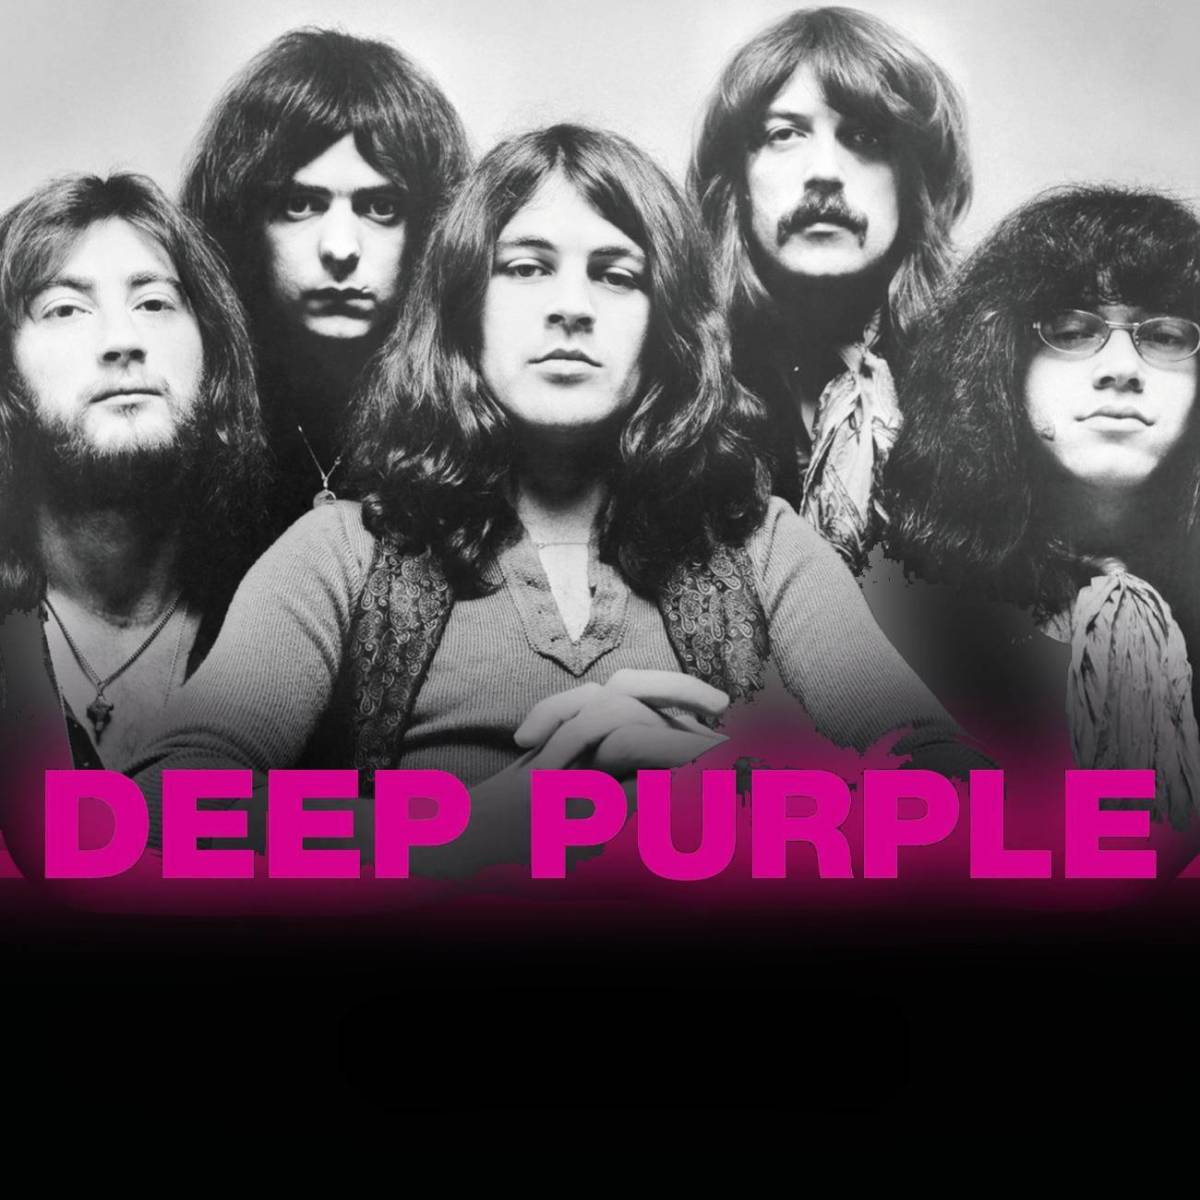 6-deep-purple-songs-you-wont-believe-they-were-stolen